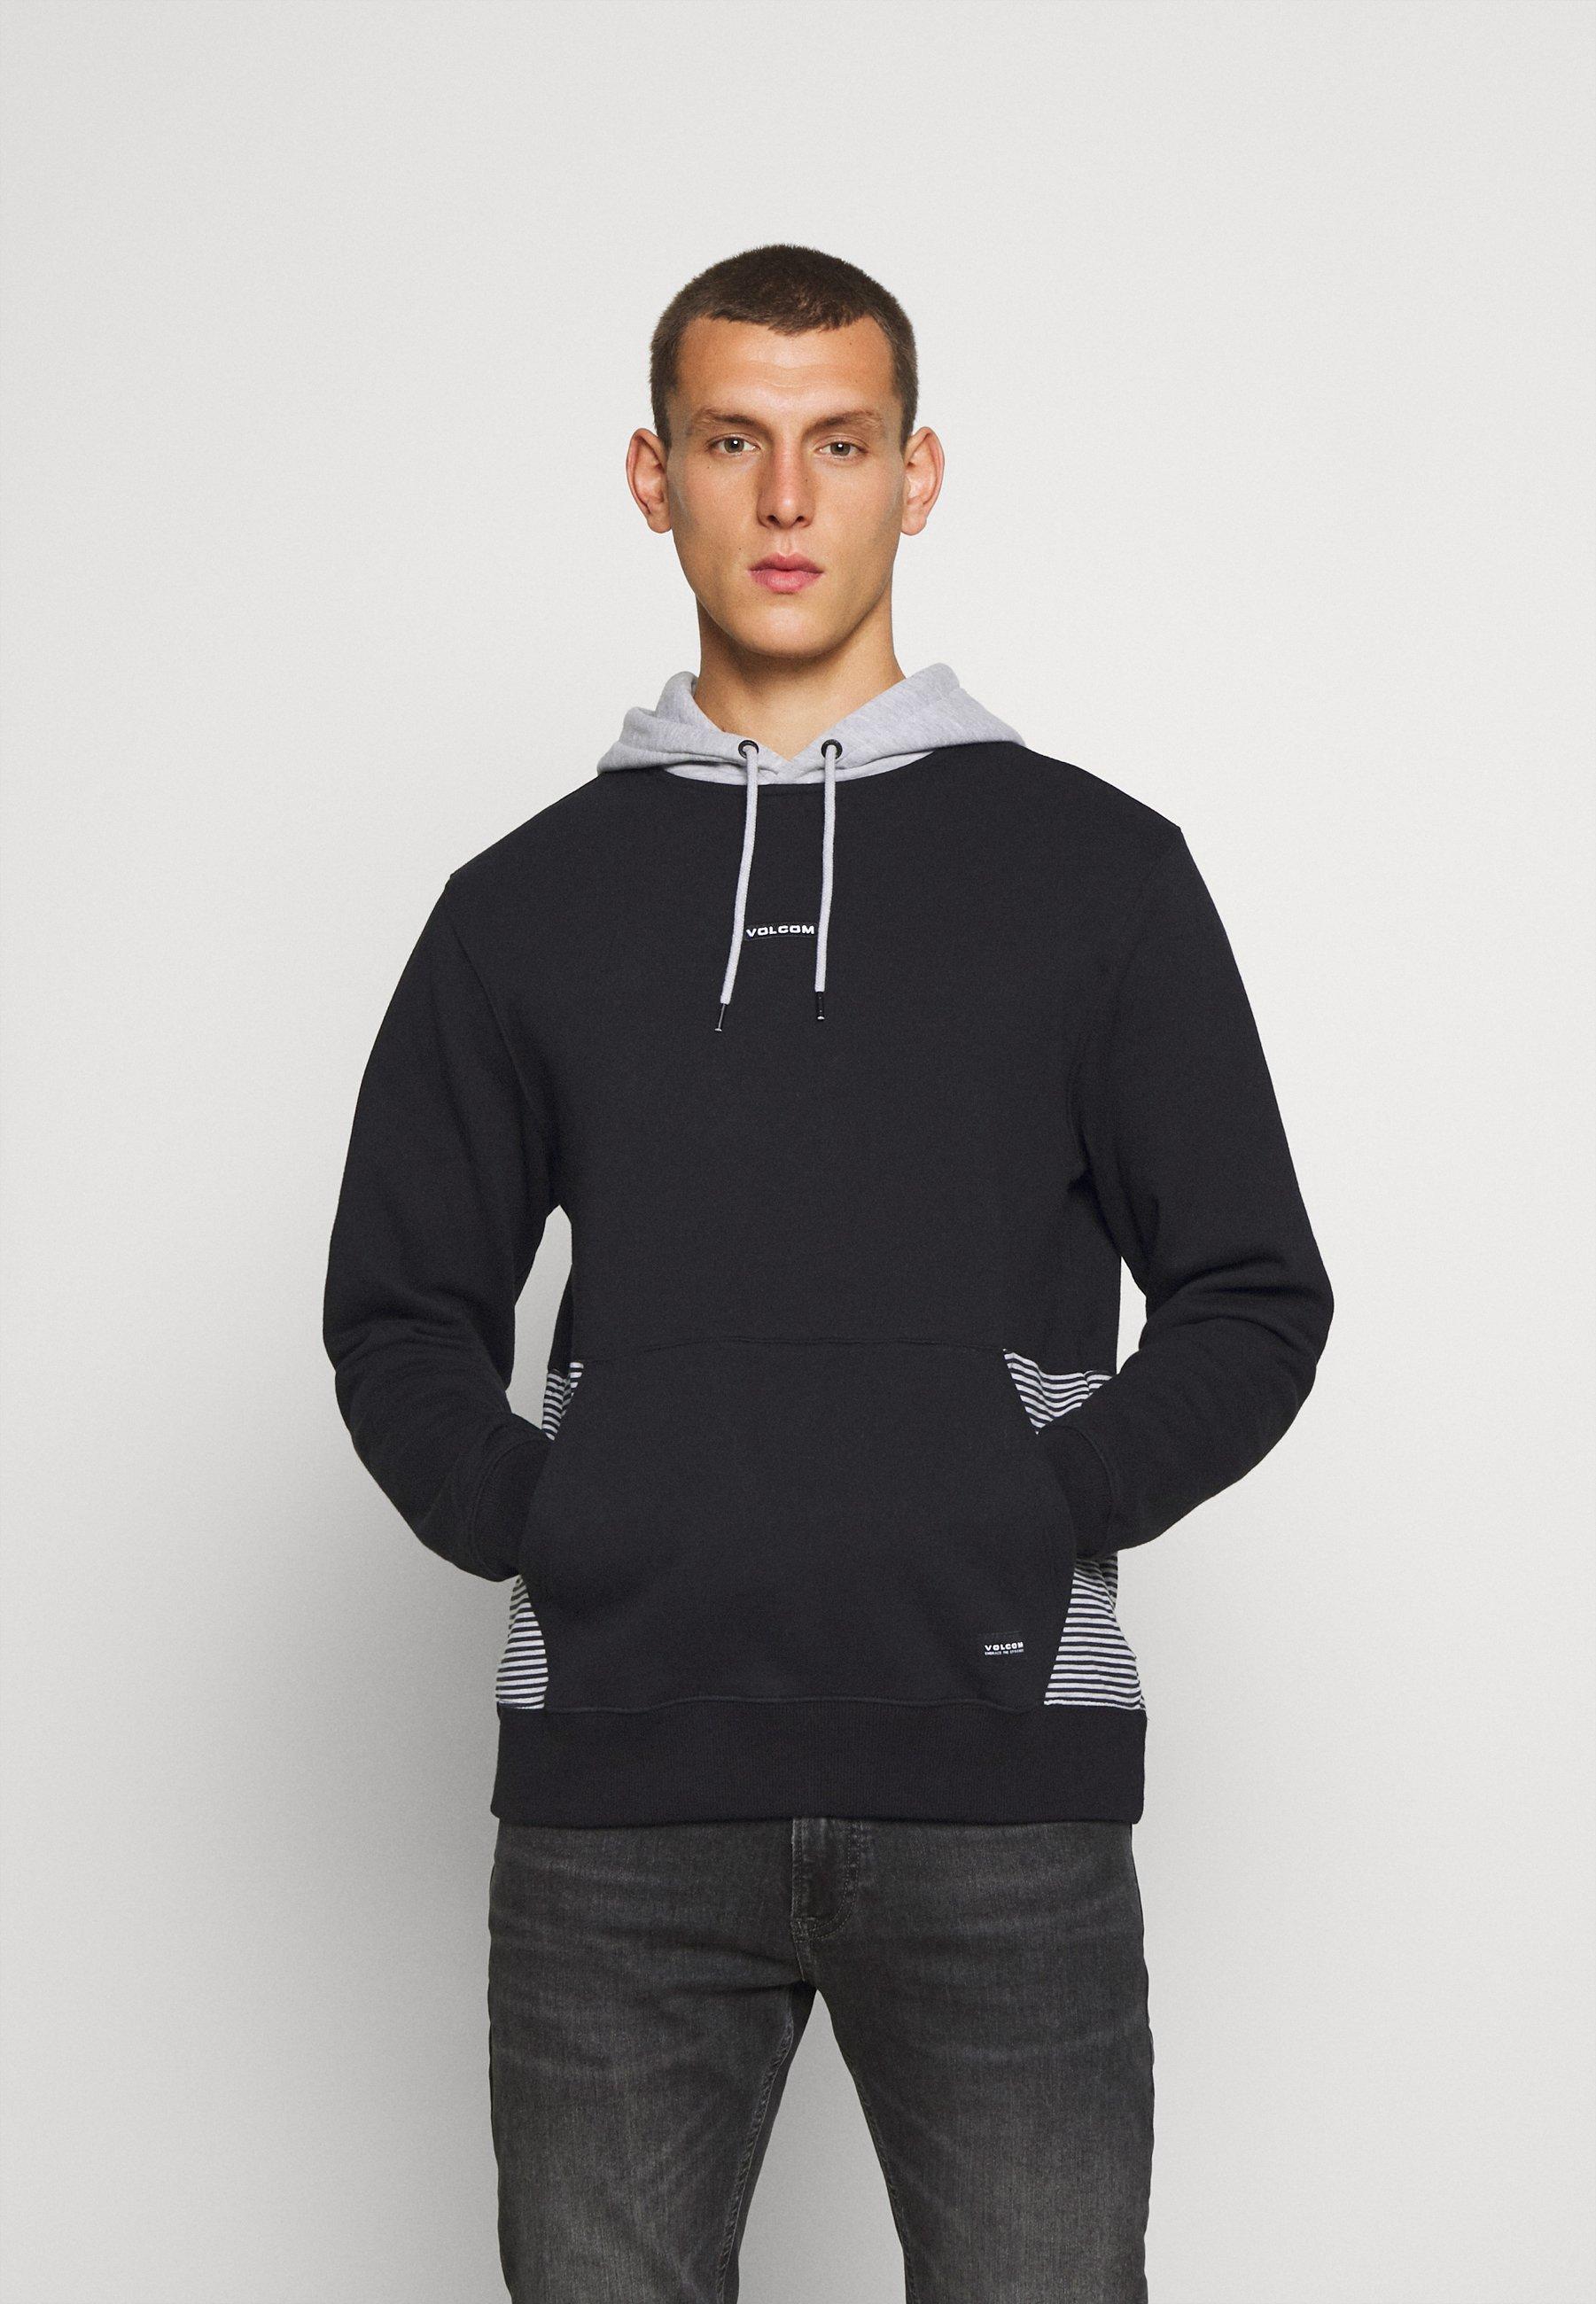 Shopping Online Cool Shopping Men's Clothing Volcom FORZEE  Hoodie black DuShX1I3m 9veAGy03X